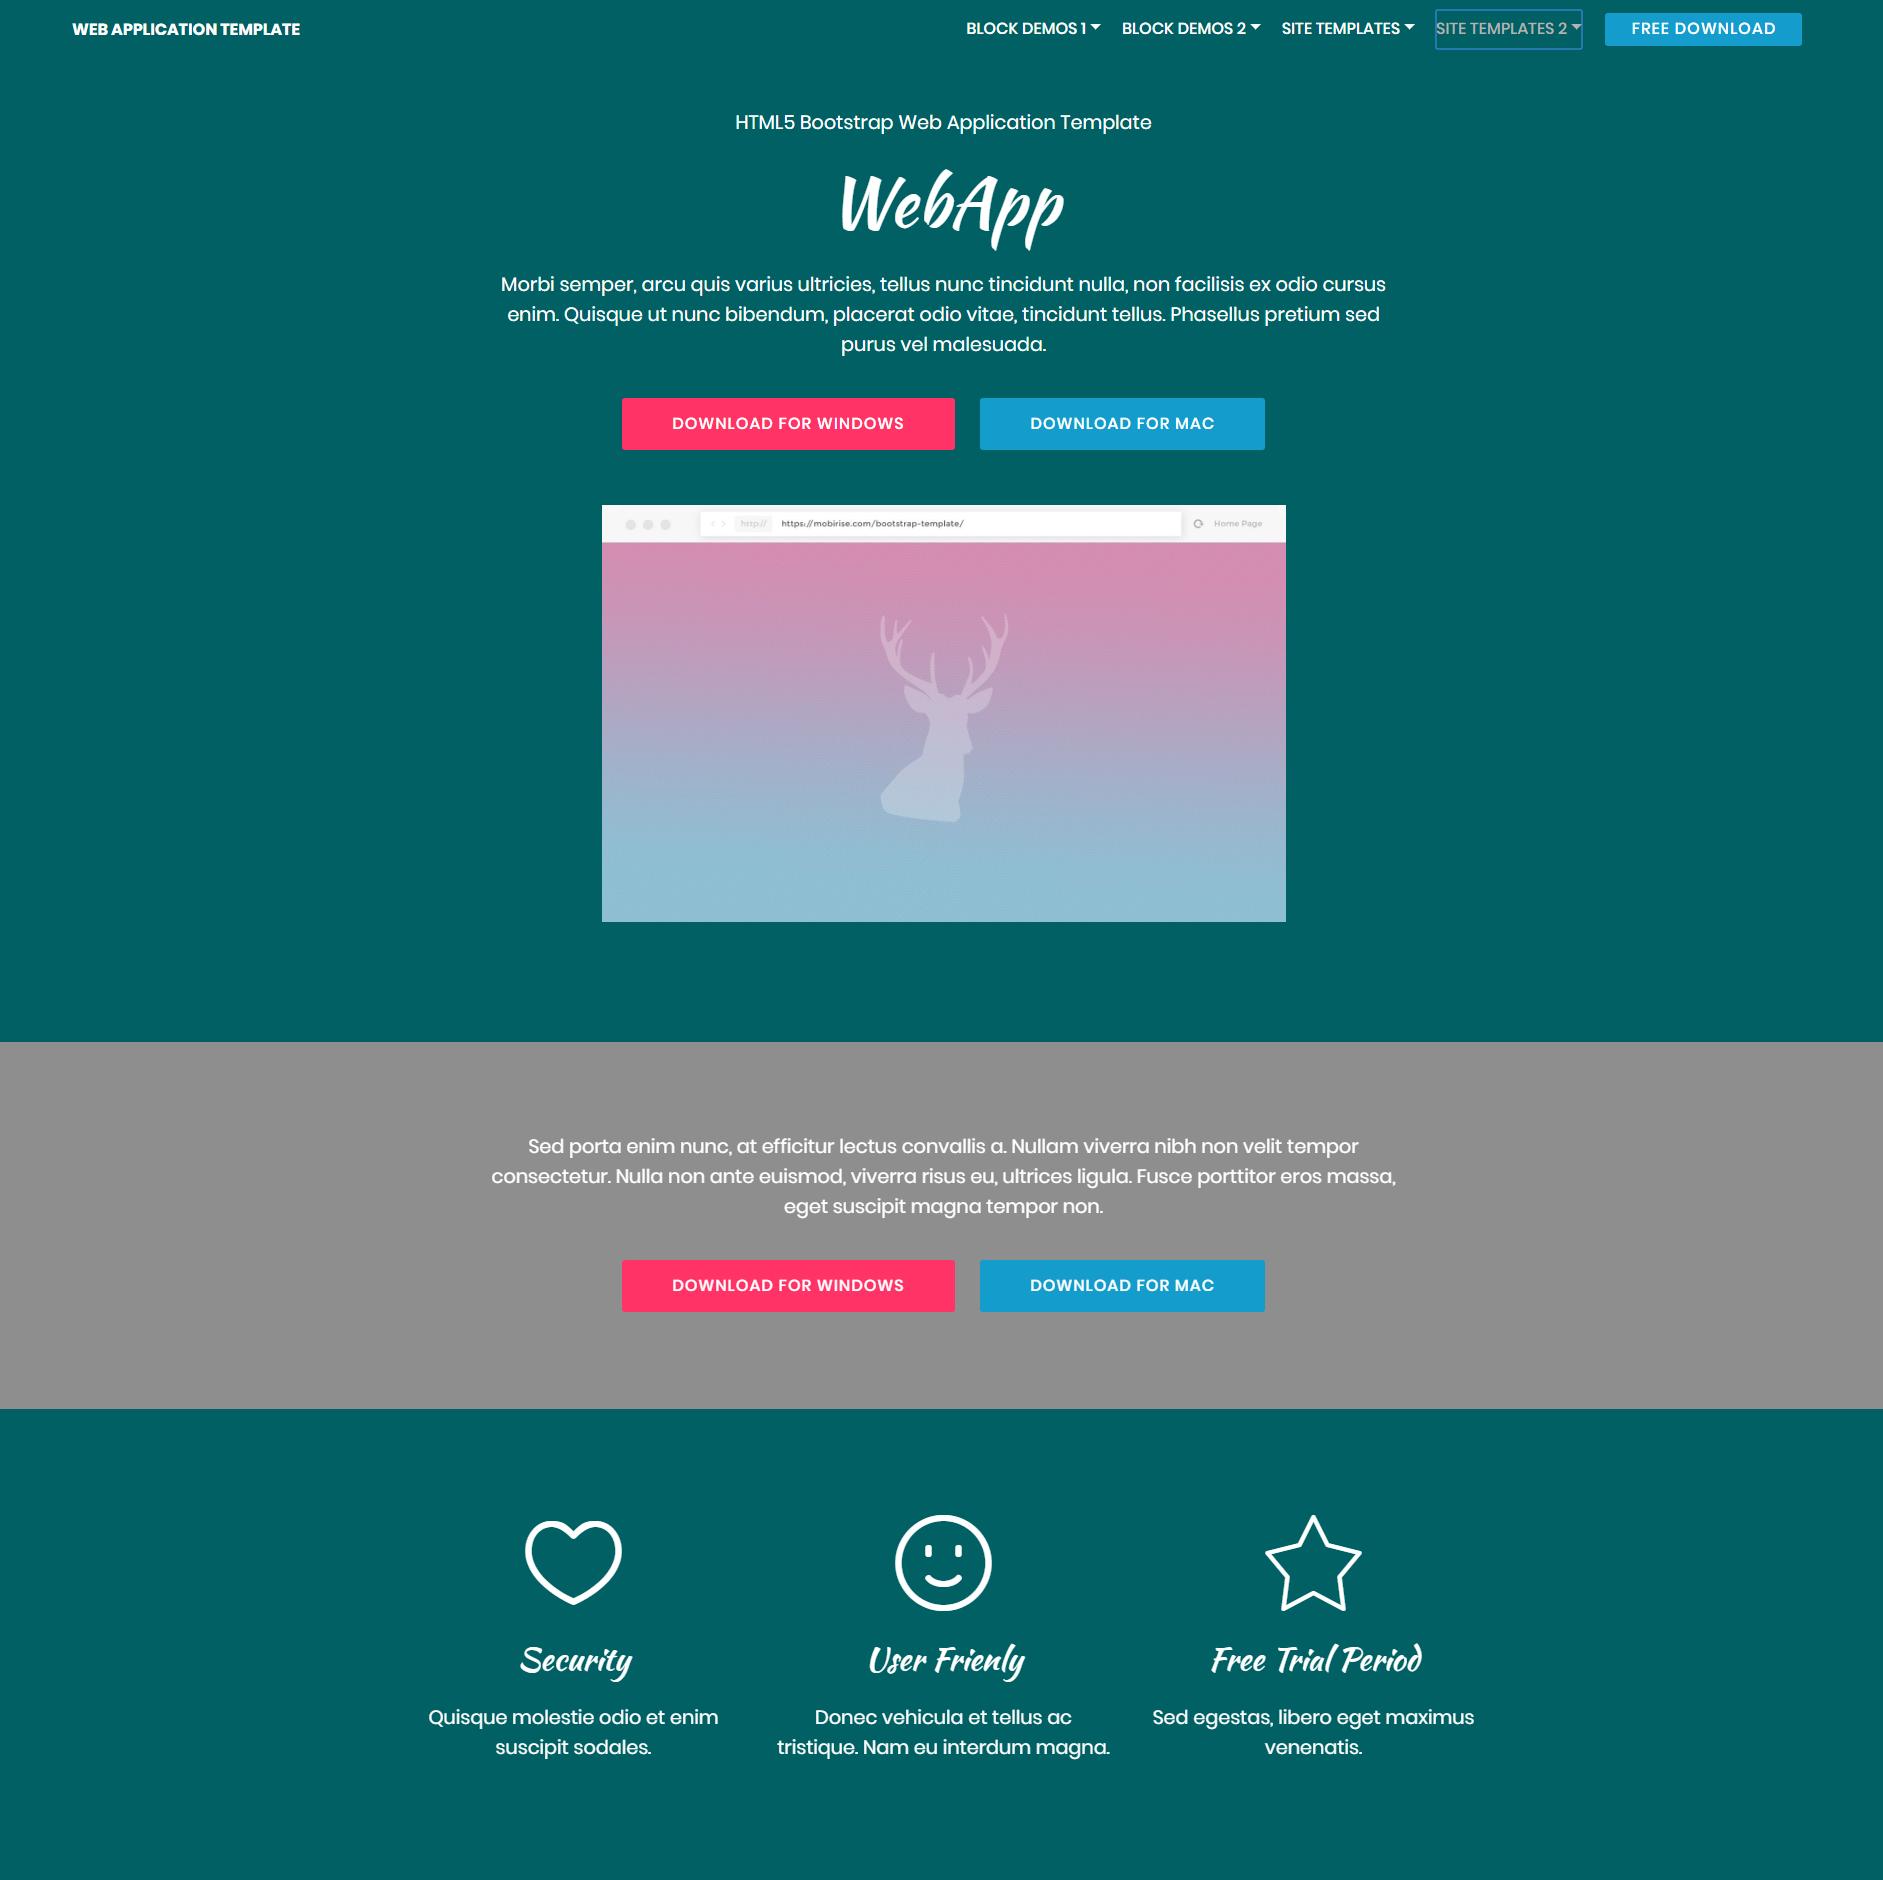 HTML5 Bootstrap Web Application Templates